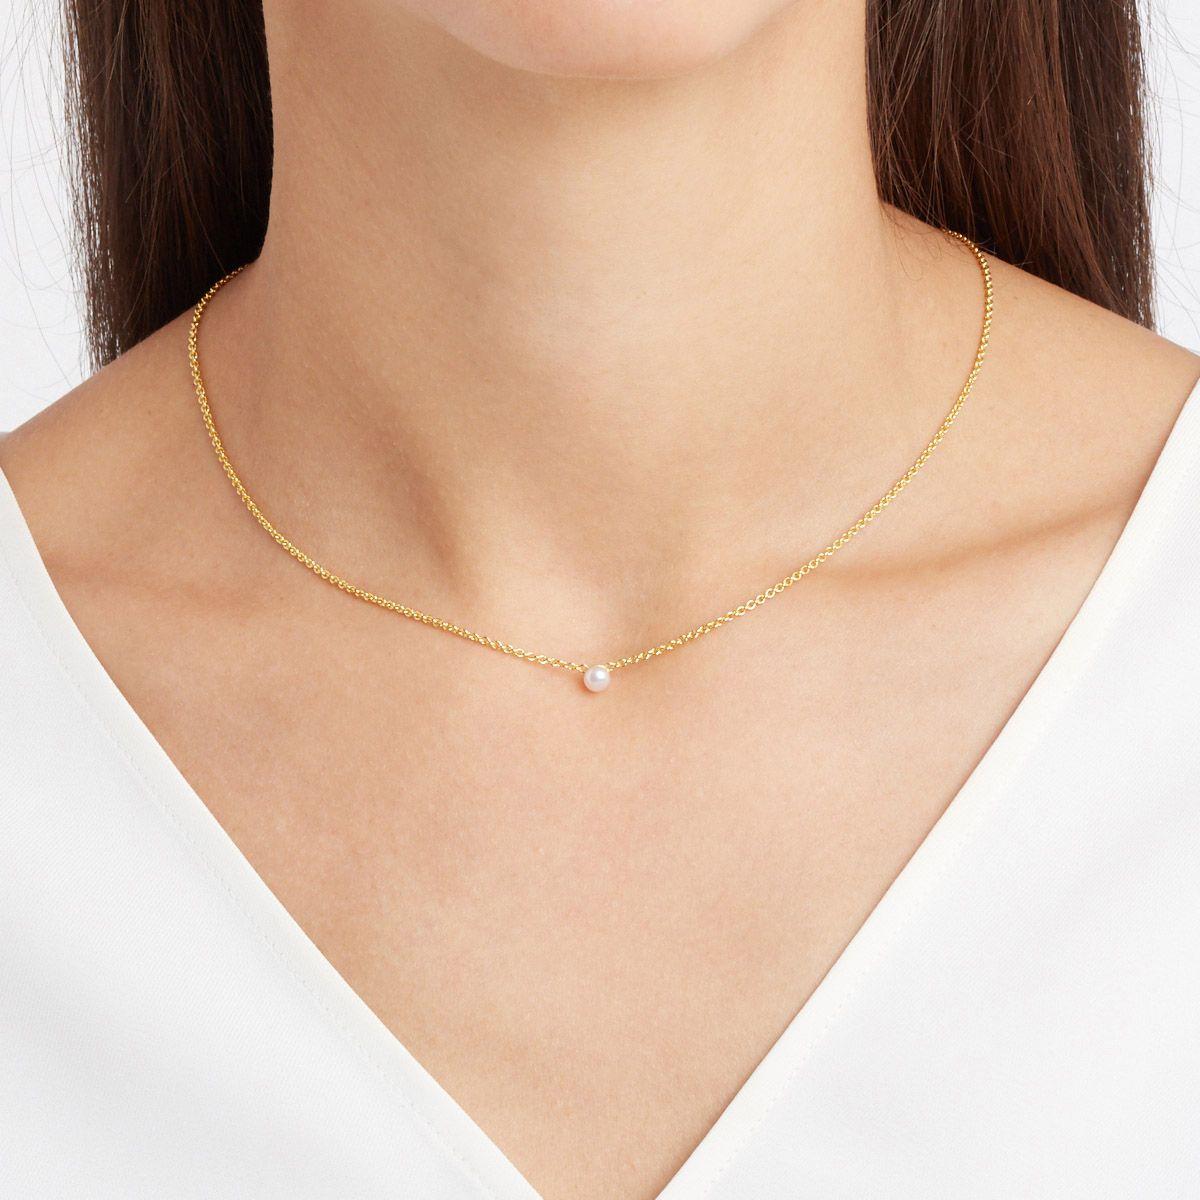 Sinja - Perlenketten - 14k vergoldet